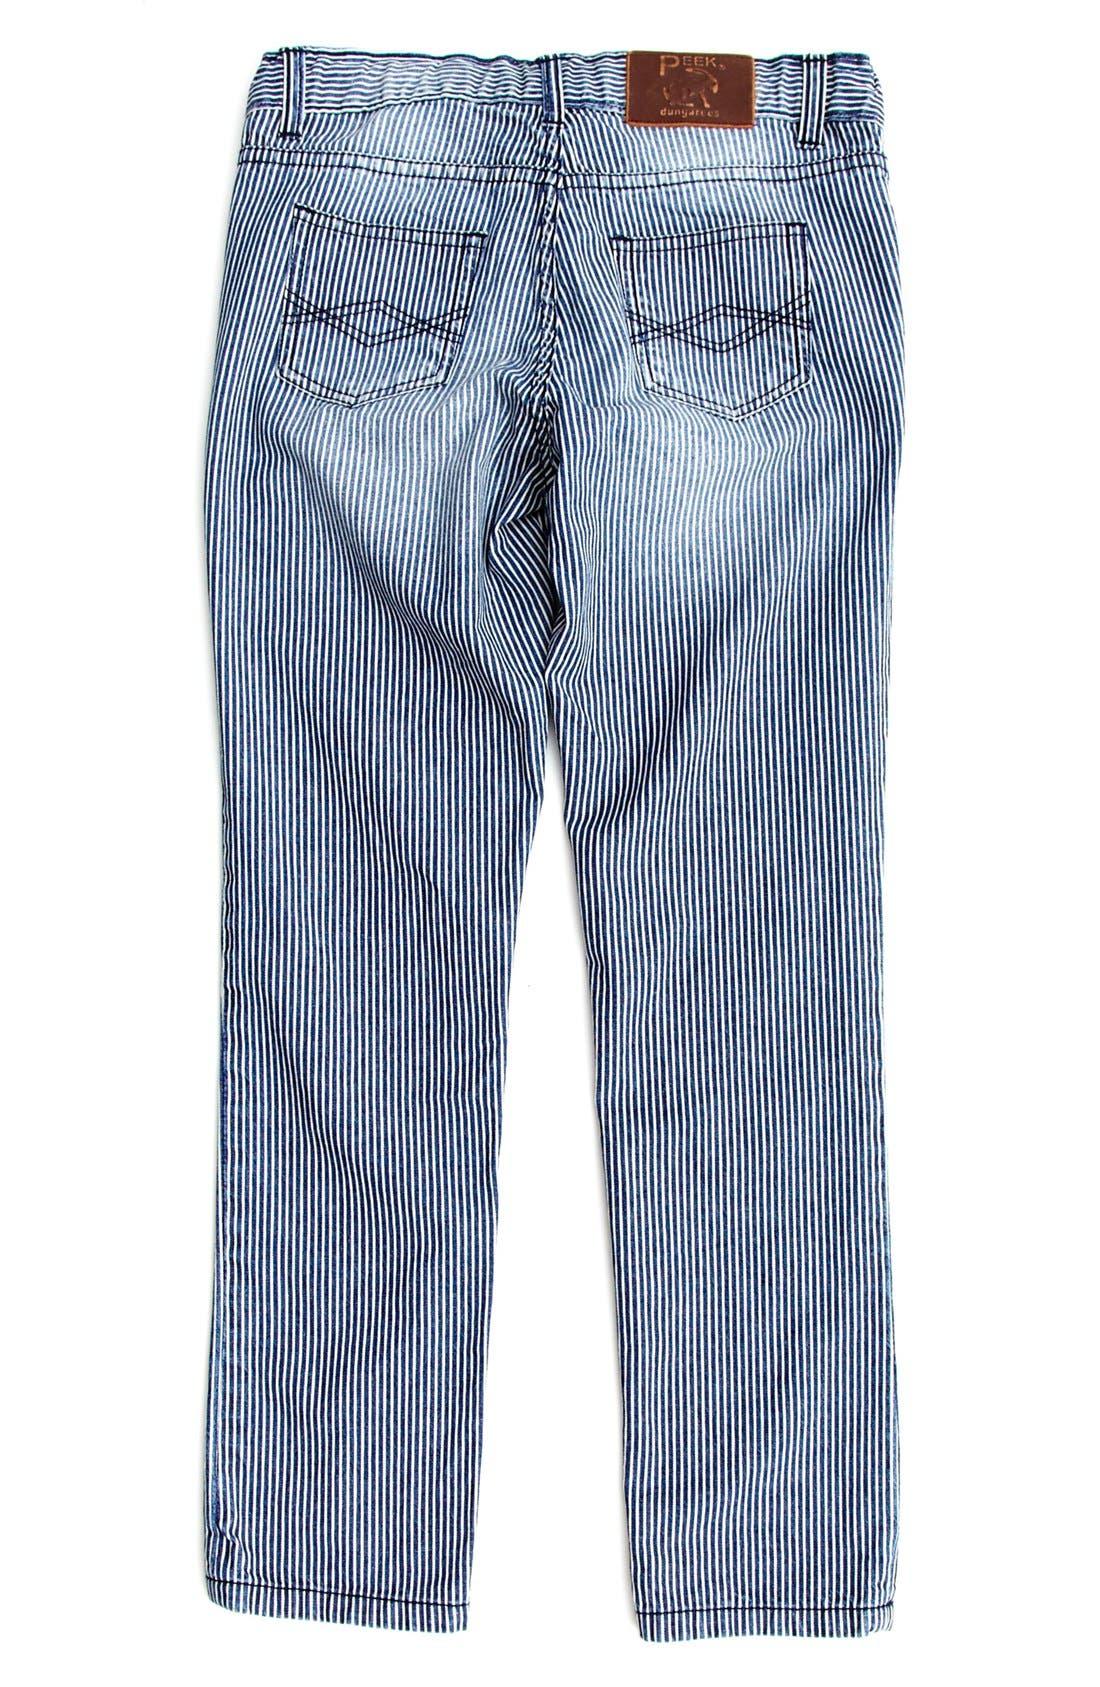 Main Image - Peek 'Margot' Railroad Stripe Skinny Jeans (Toddler Girls, Little Girls & Big Girls)